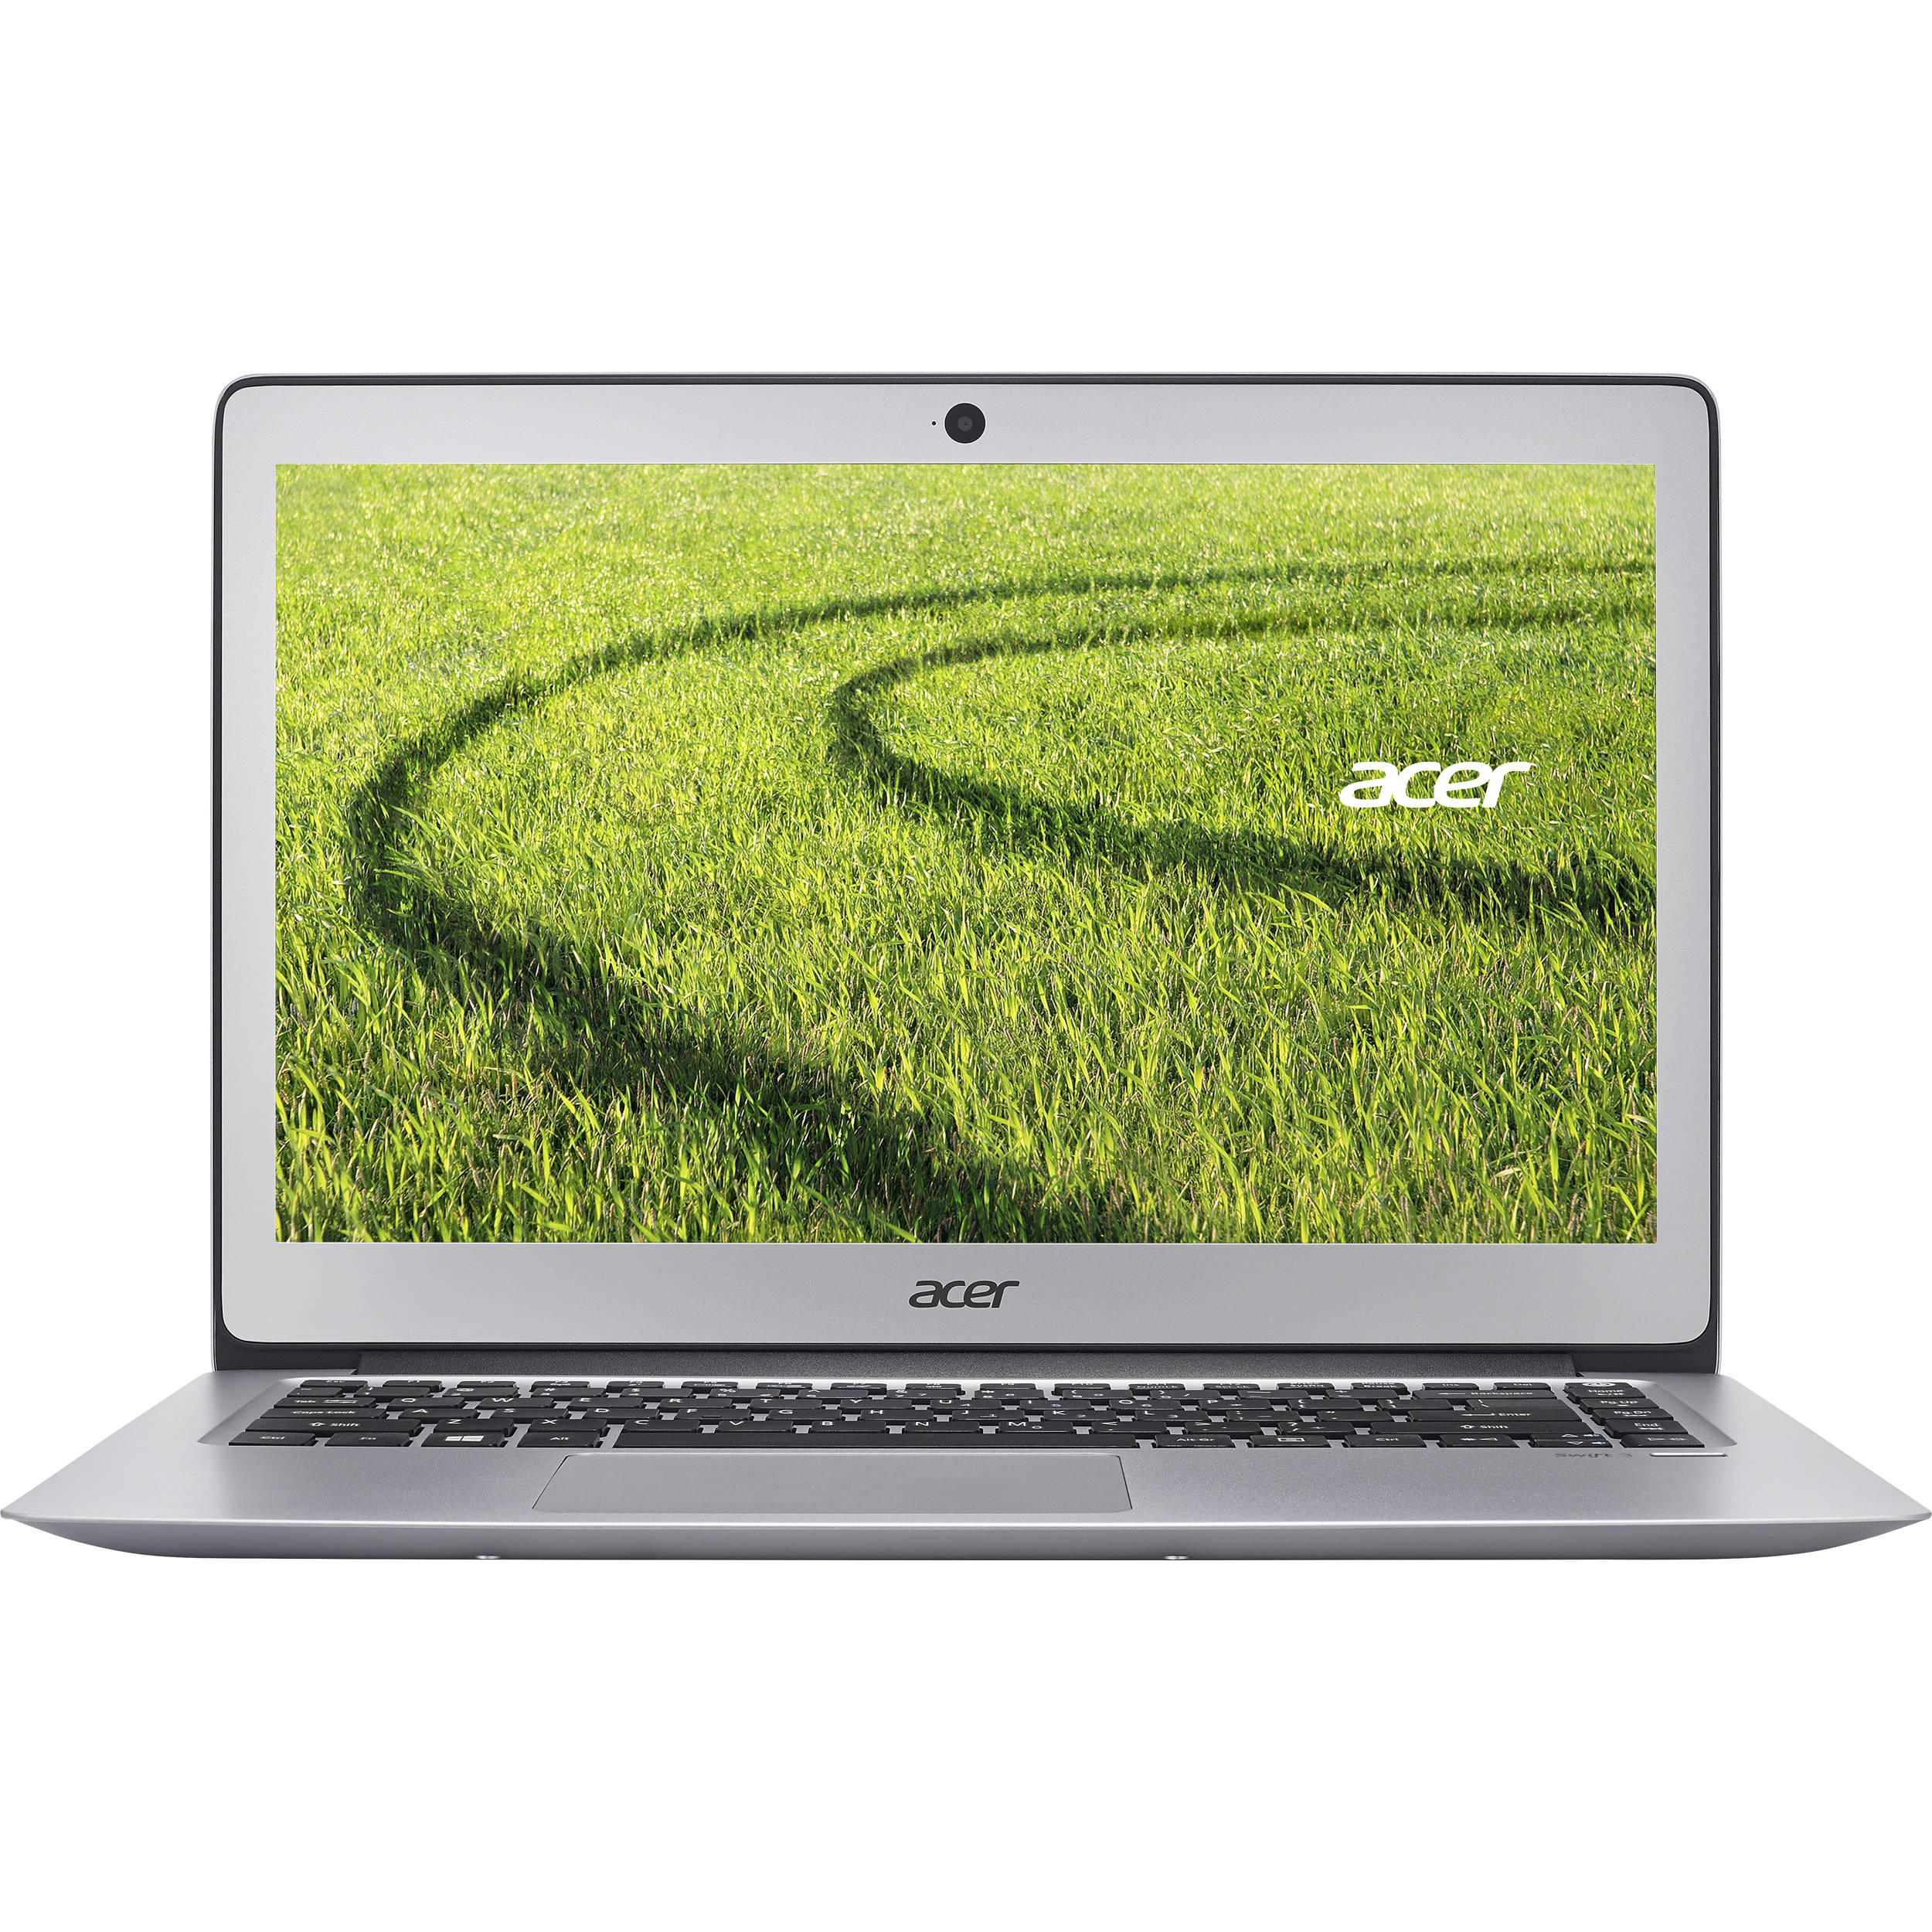 Acer Swift 3 SF314-51 Notebook with Intel i7-7500U, 8GB 5...